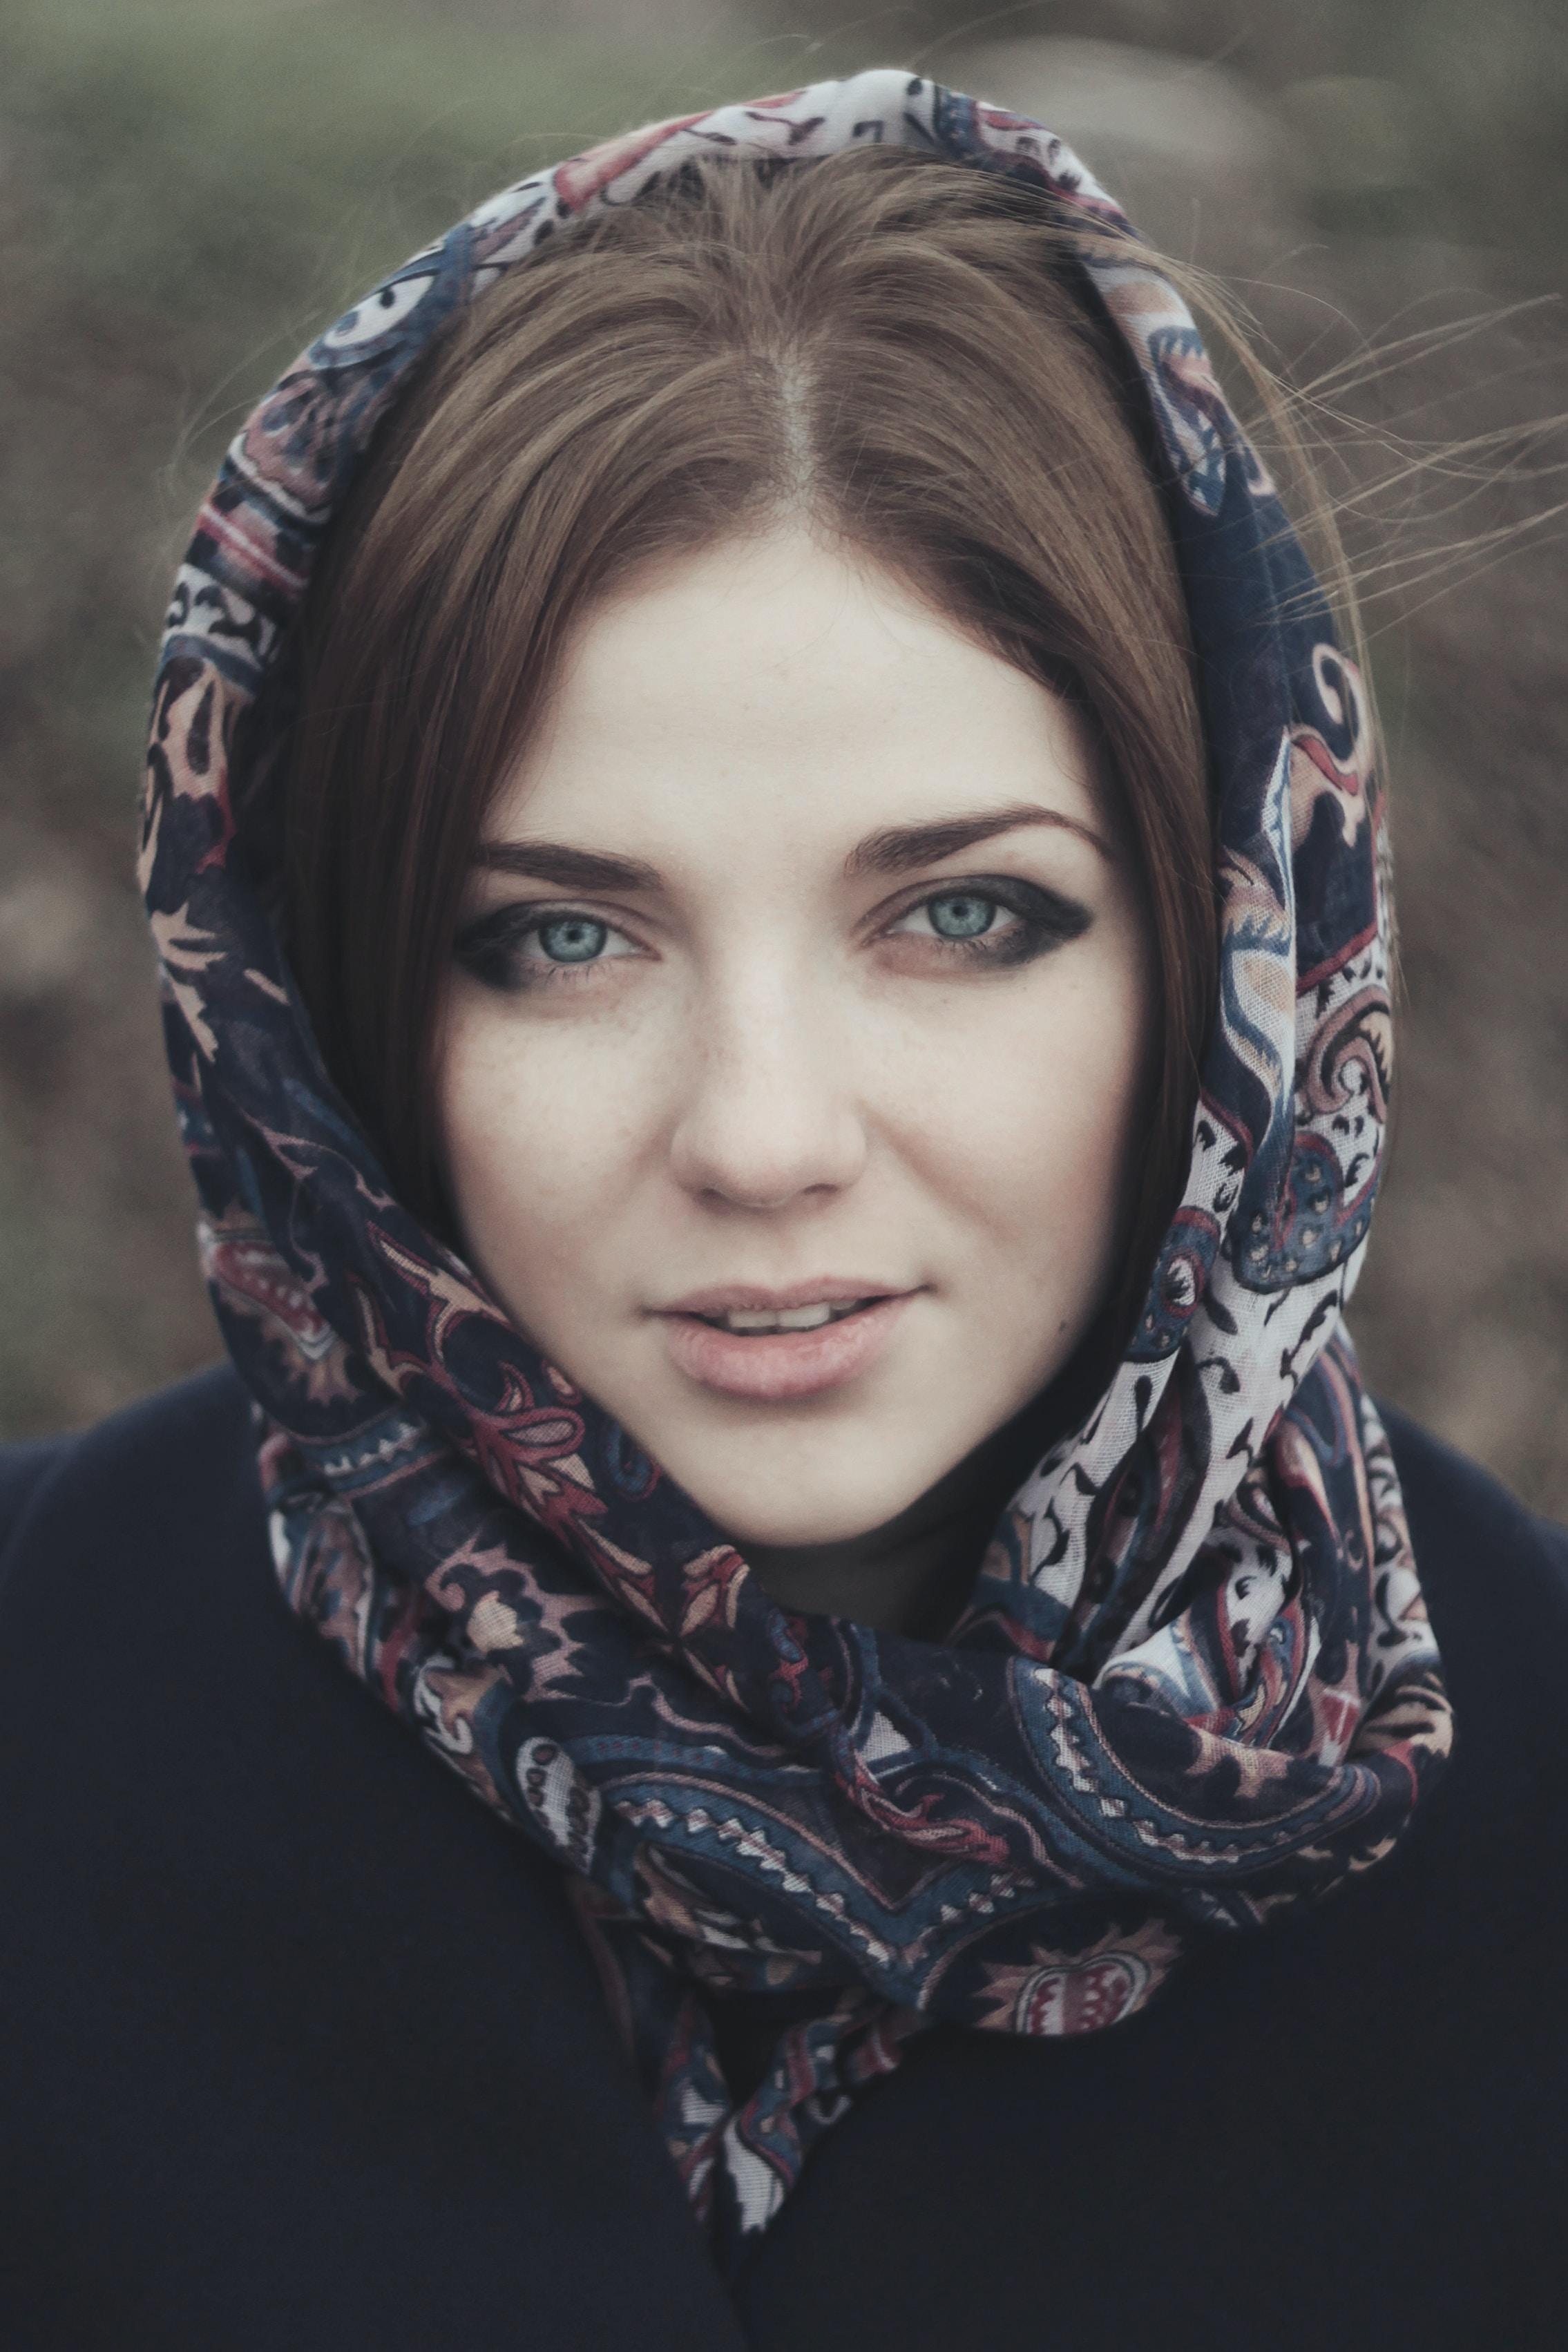 woman with floral hijab headscarf portrait photo